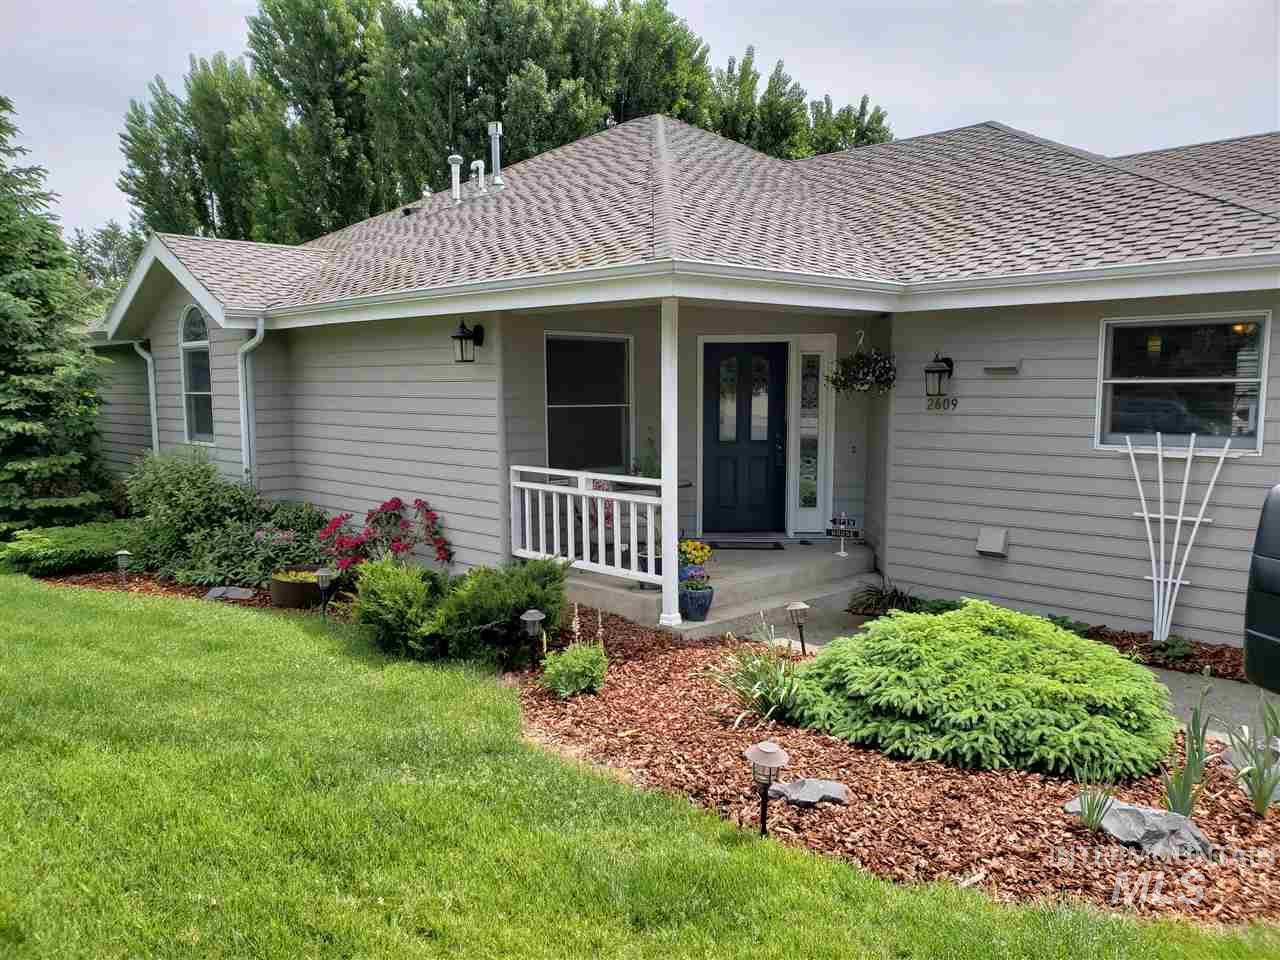 Single Family Home for Sale at 2609 Wildrose 2609 Wildrose Moscow, Idaho 83843